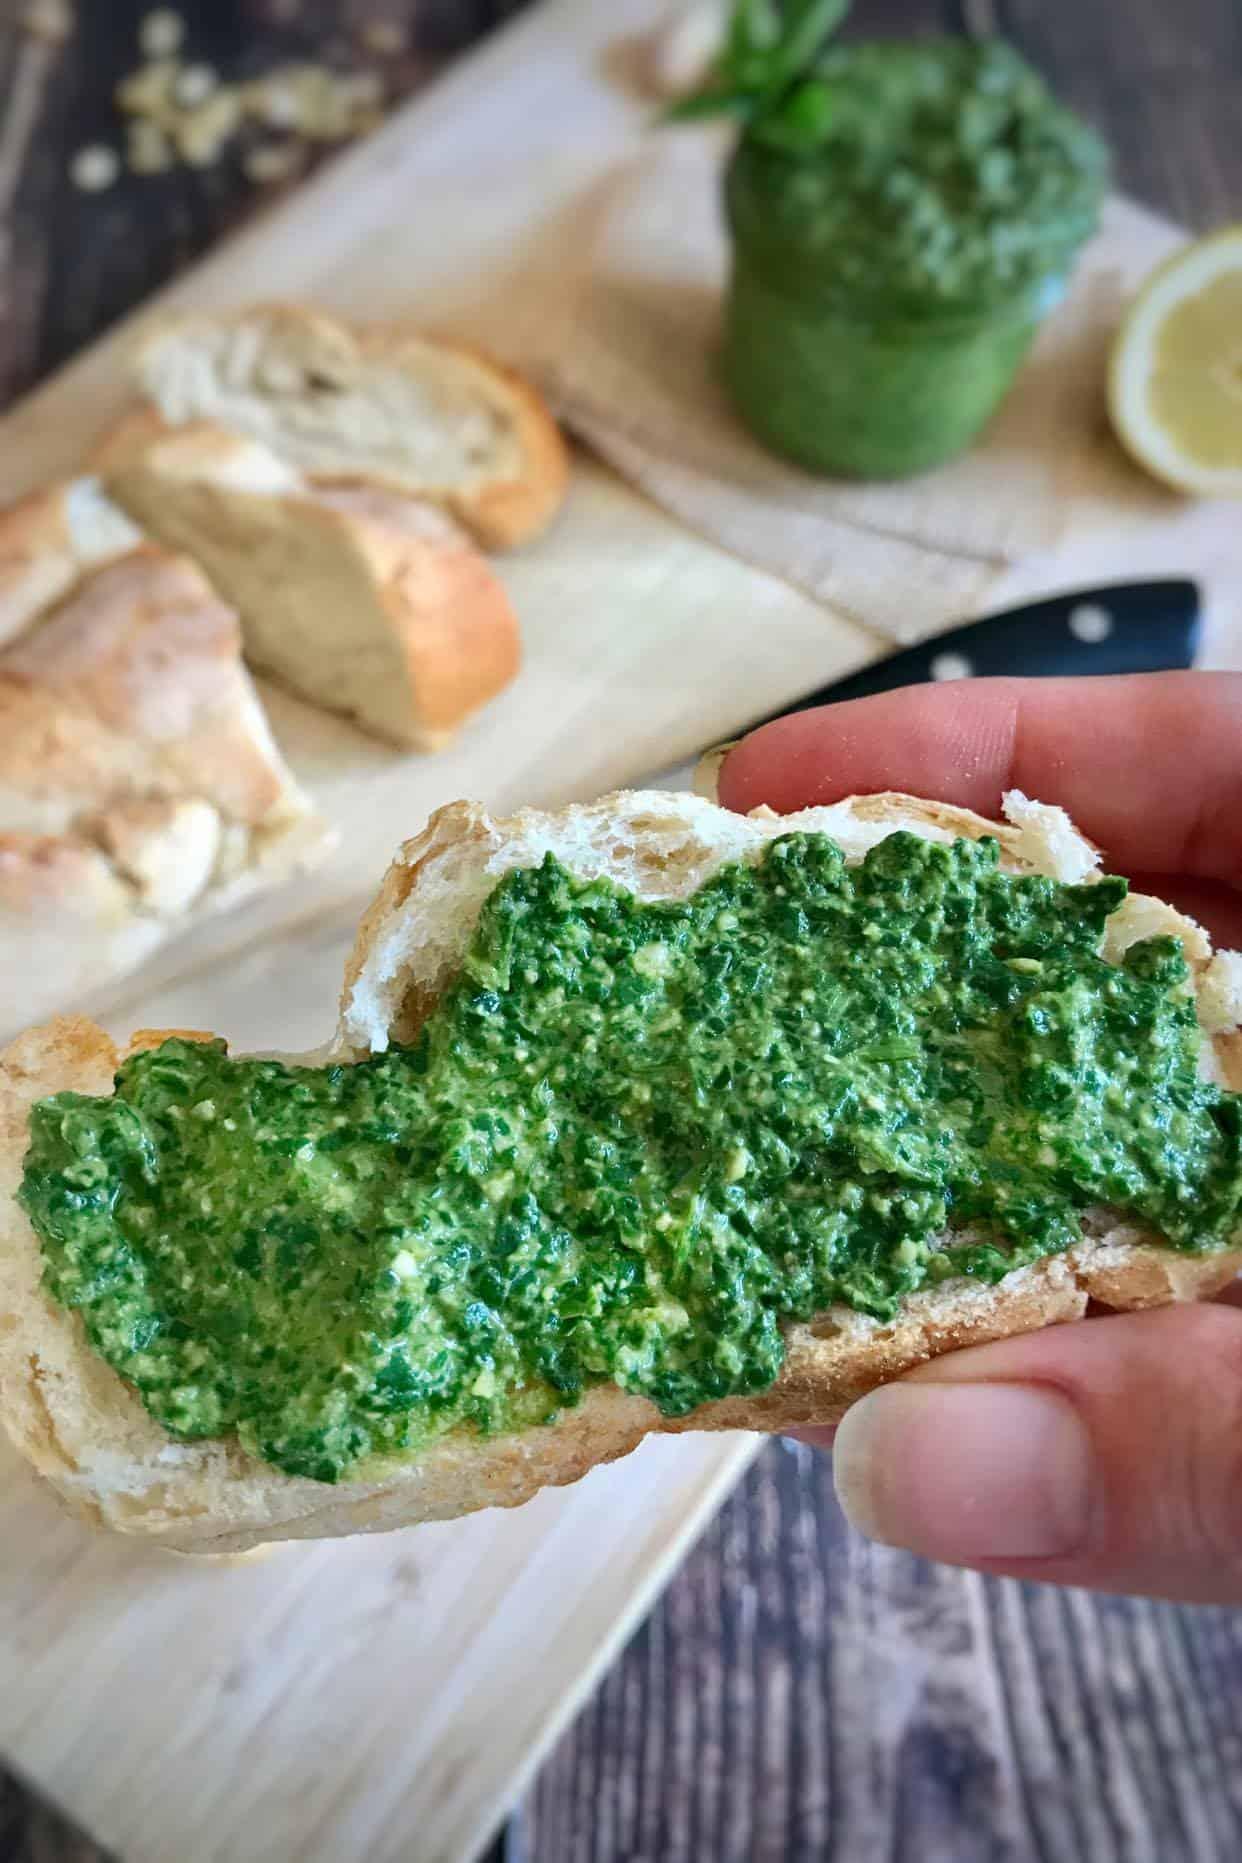 Vegetarian basil pesto spread on slice of bread.